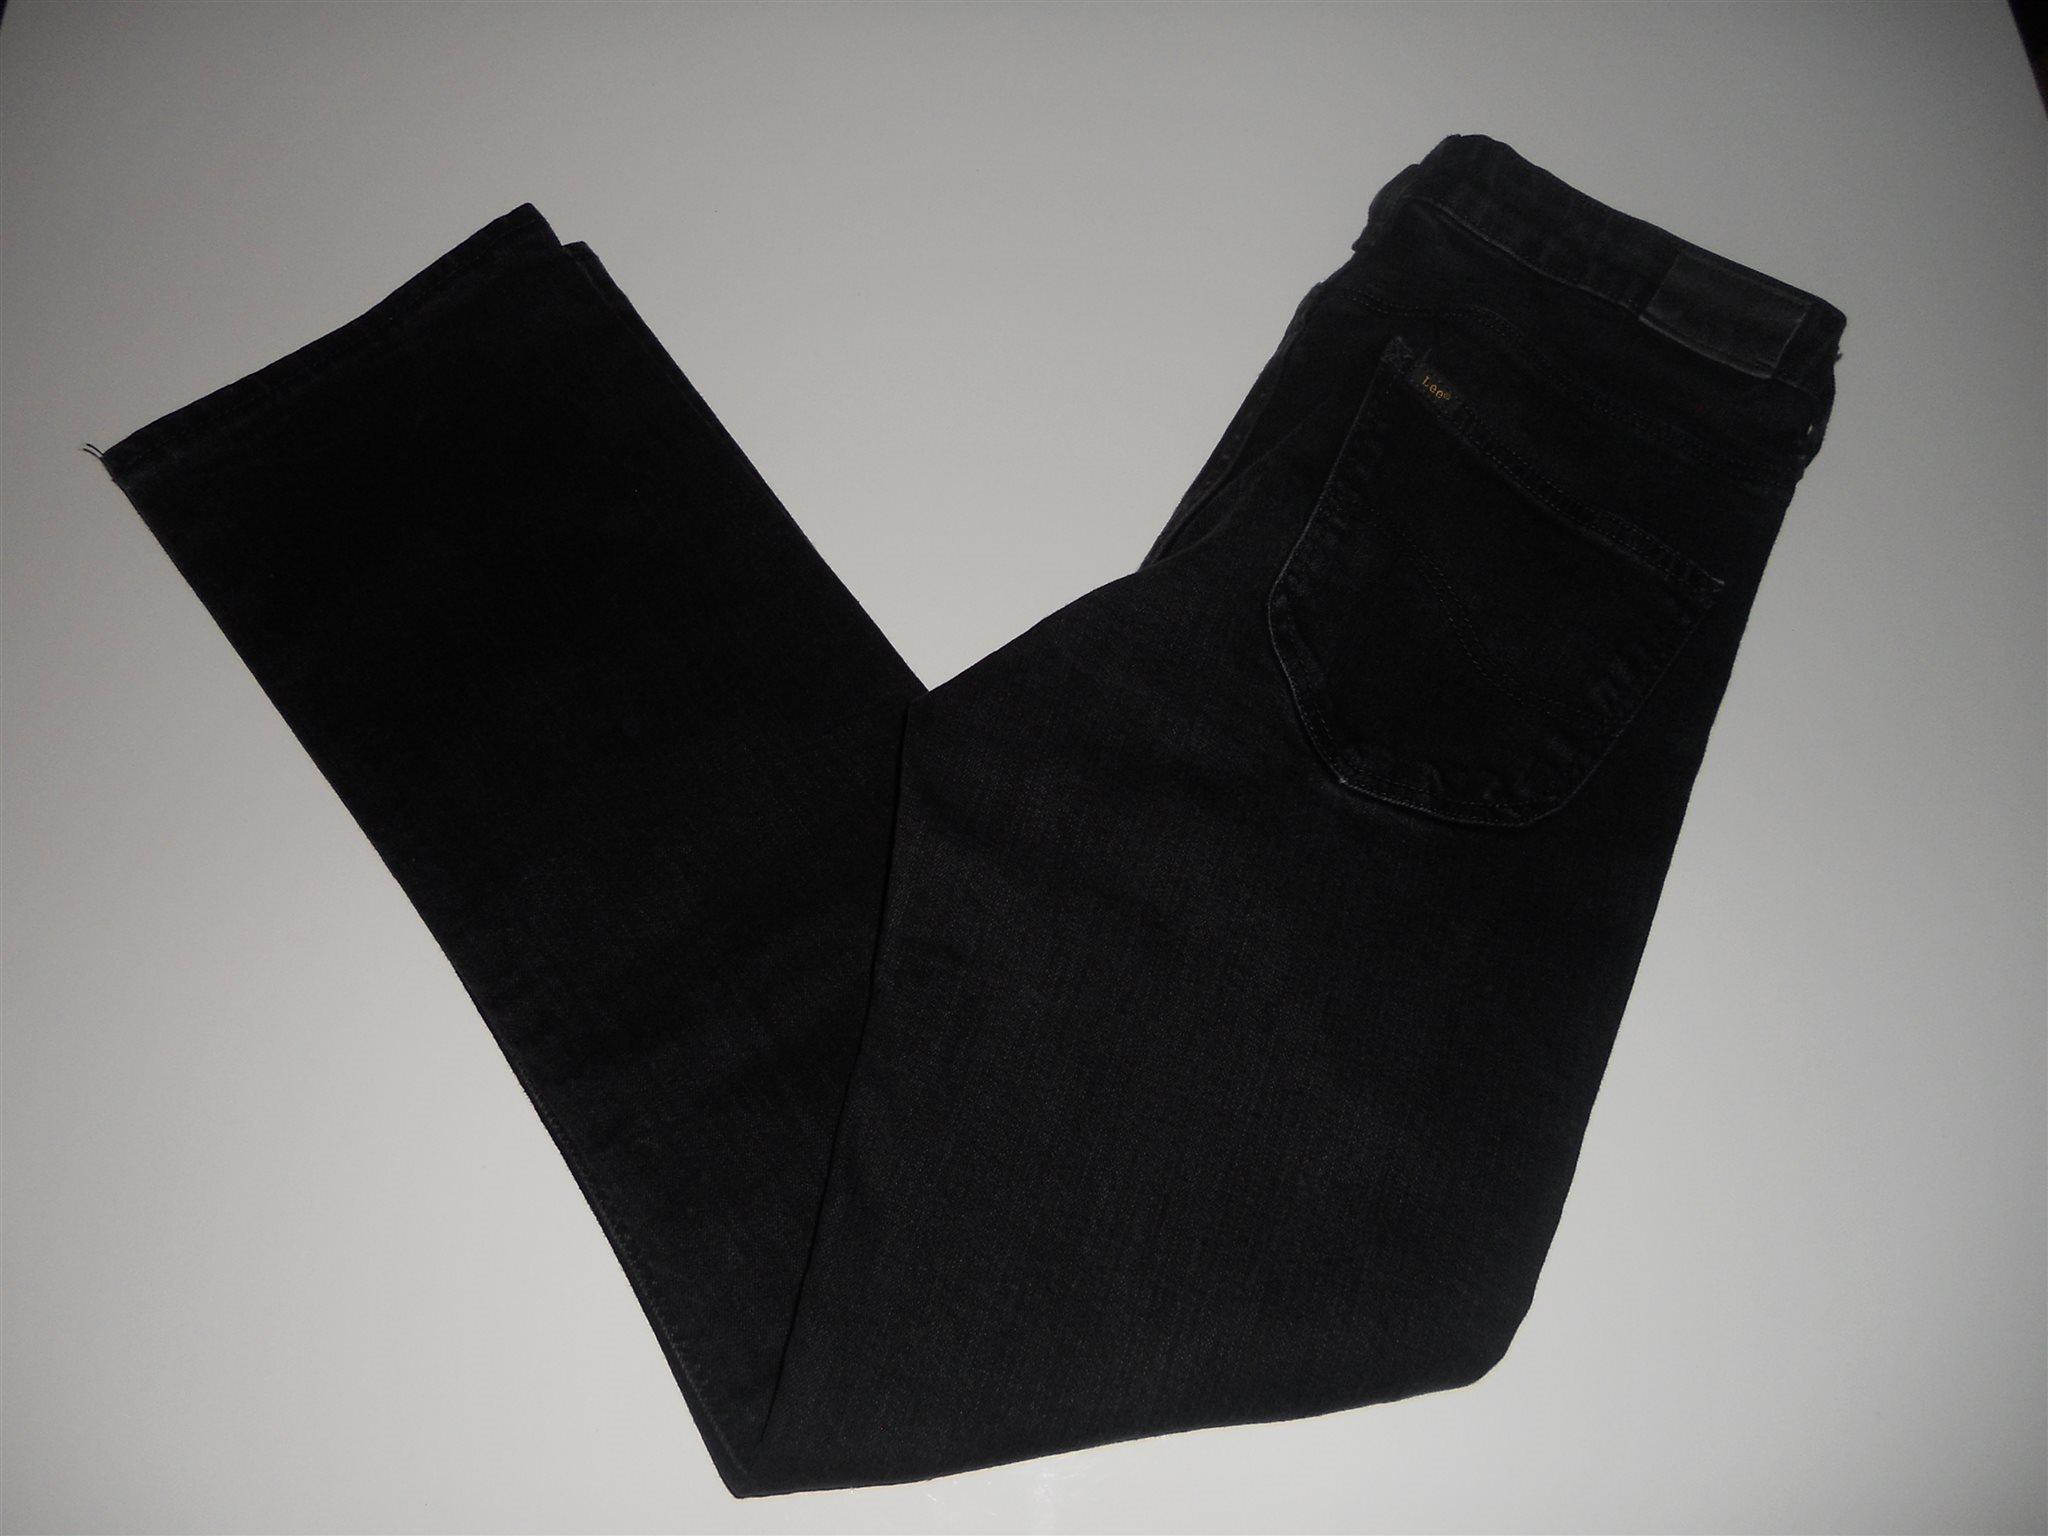 jeans storlek herr